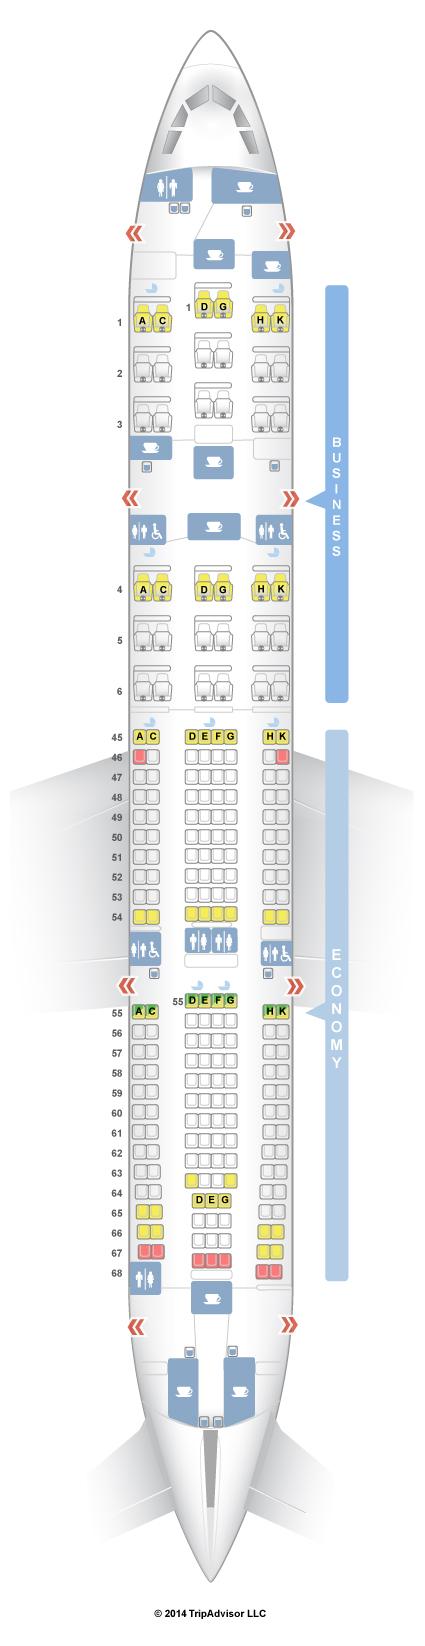 Seatguru Seat Map South African Airways Seatguru